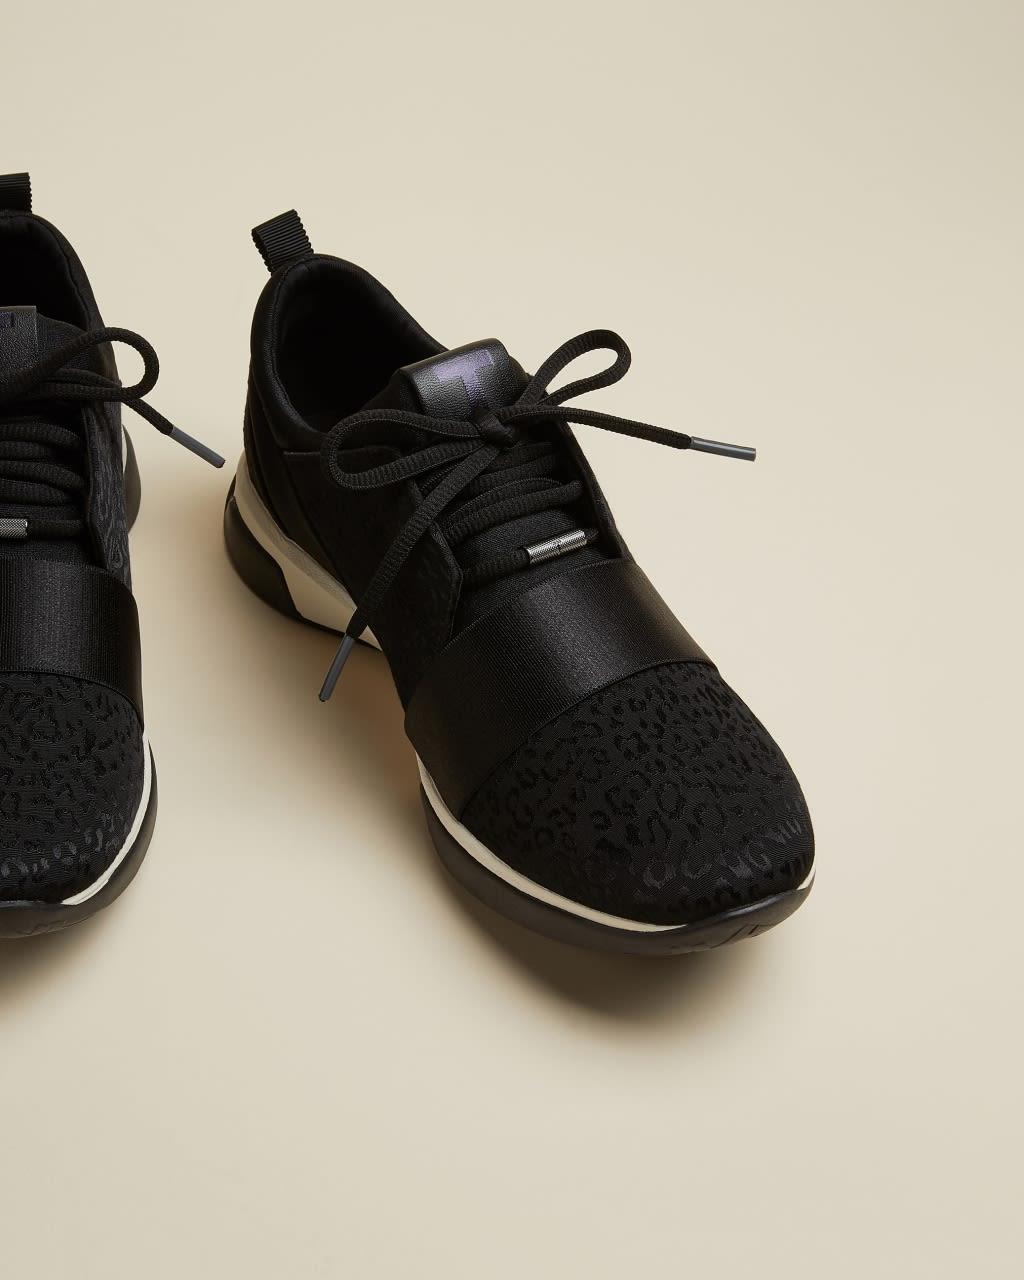 TED BAKER Sneakers Aus Jacquard Mit Leopardenprint   TED BAKER SALE